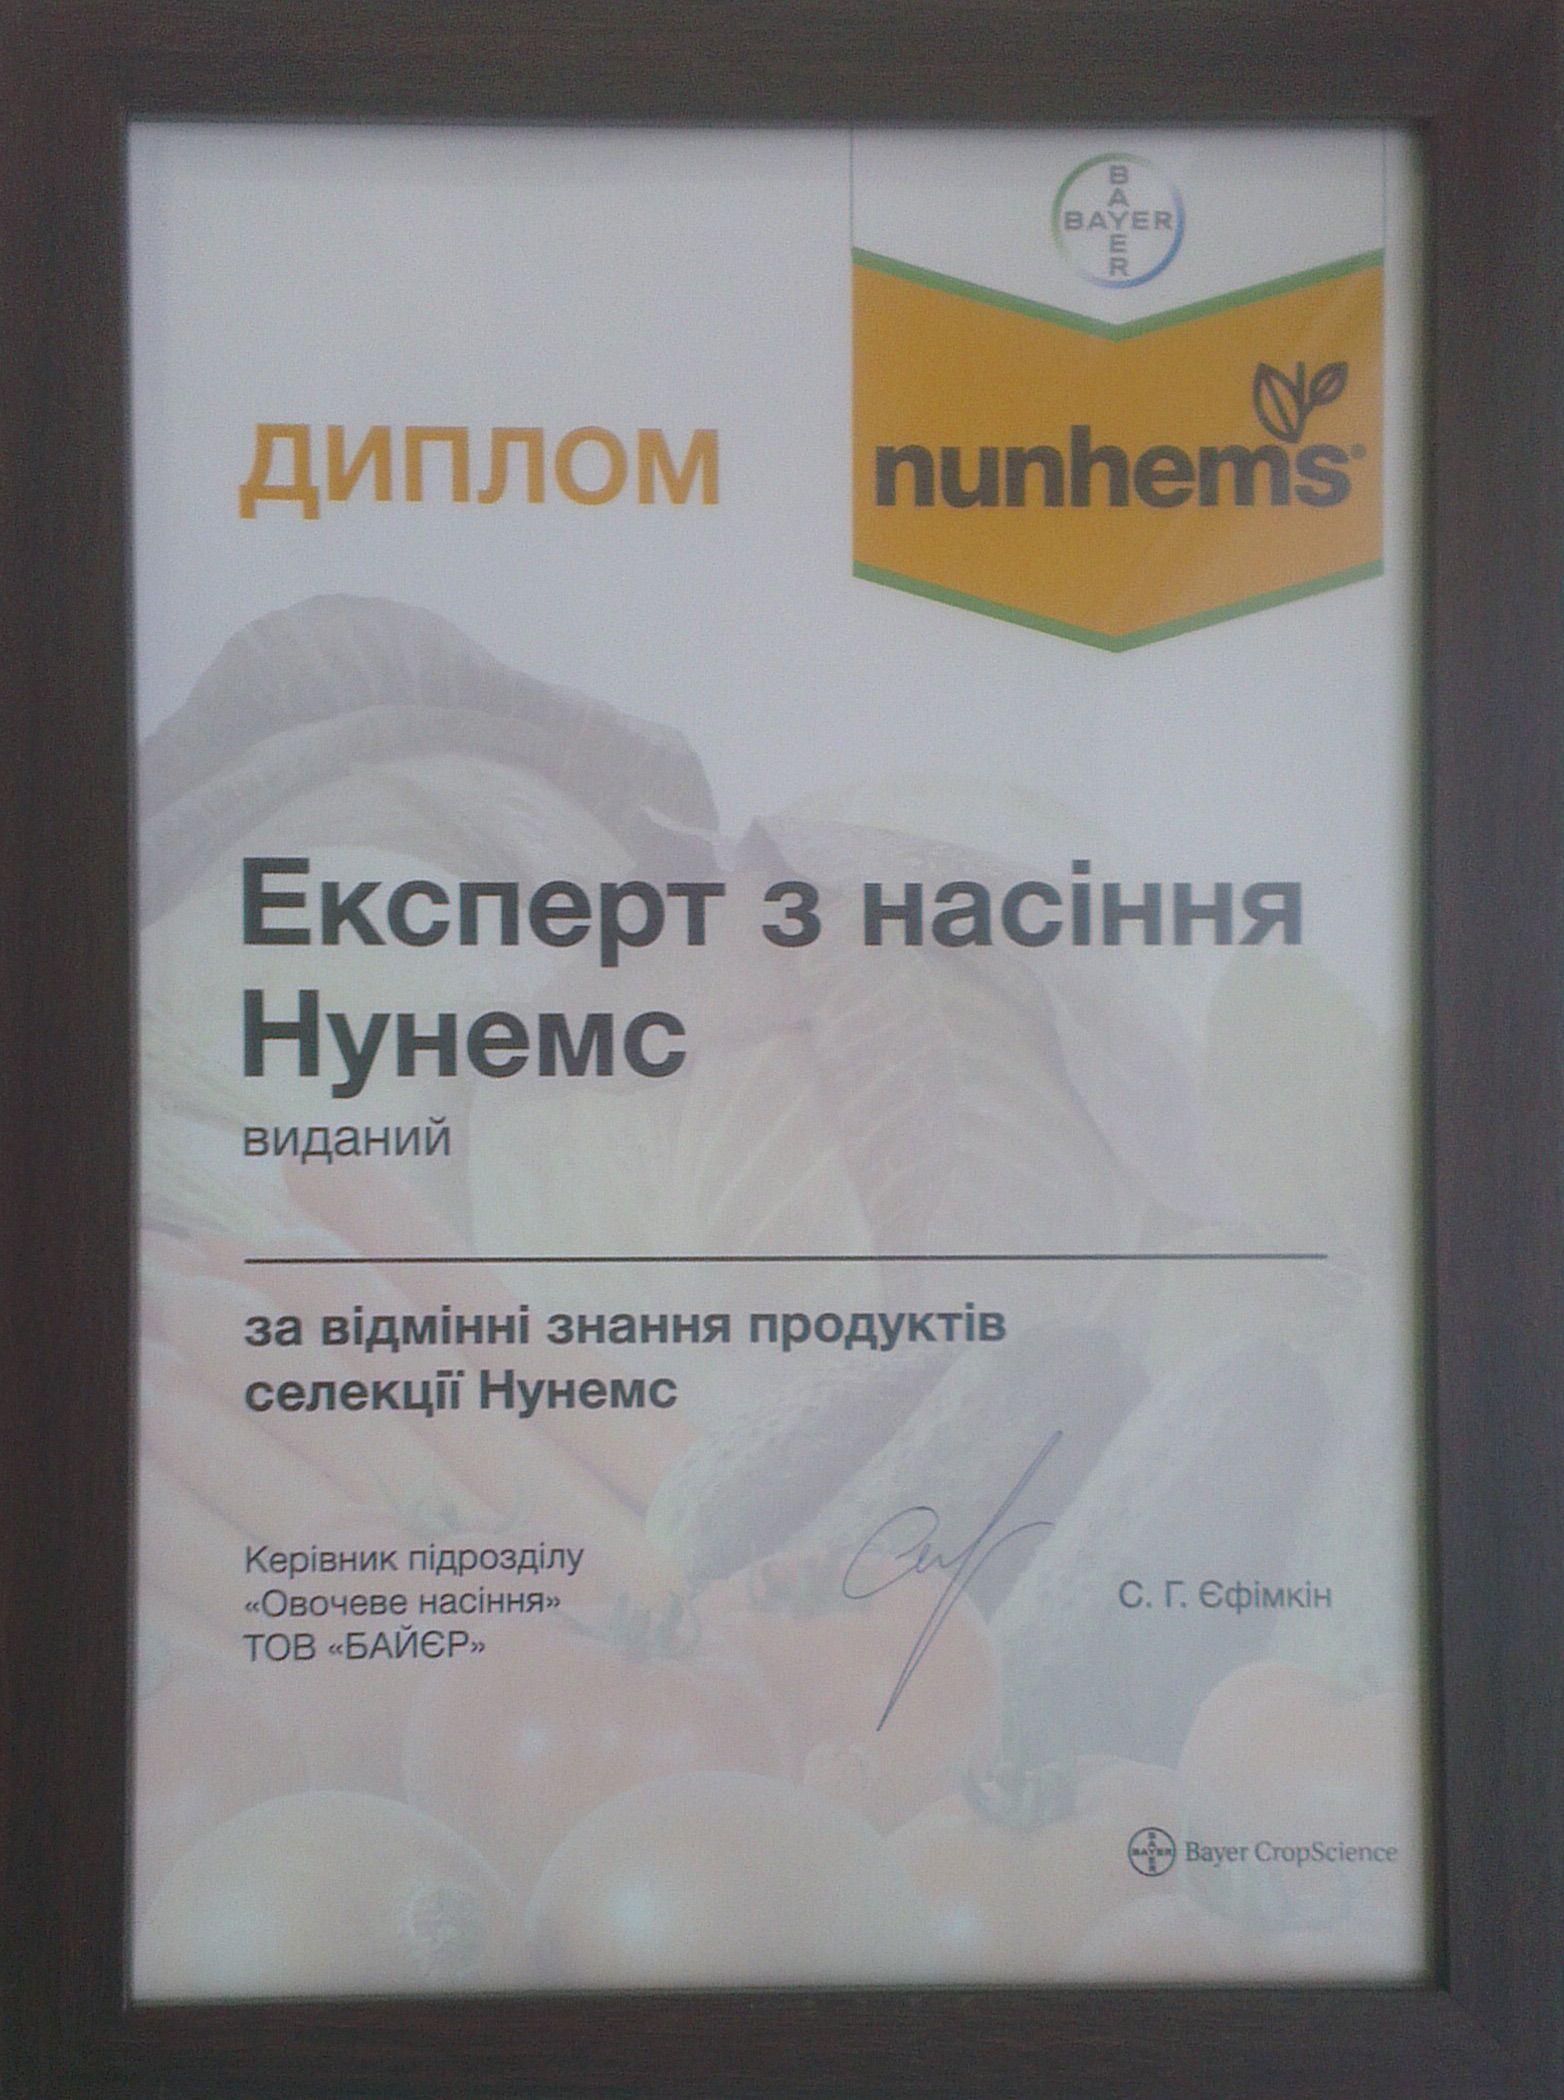 Эксперт по семенам Nunhems